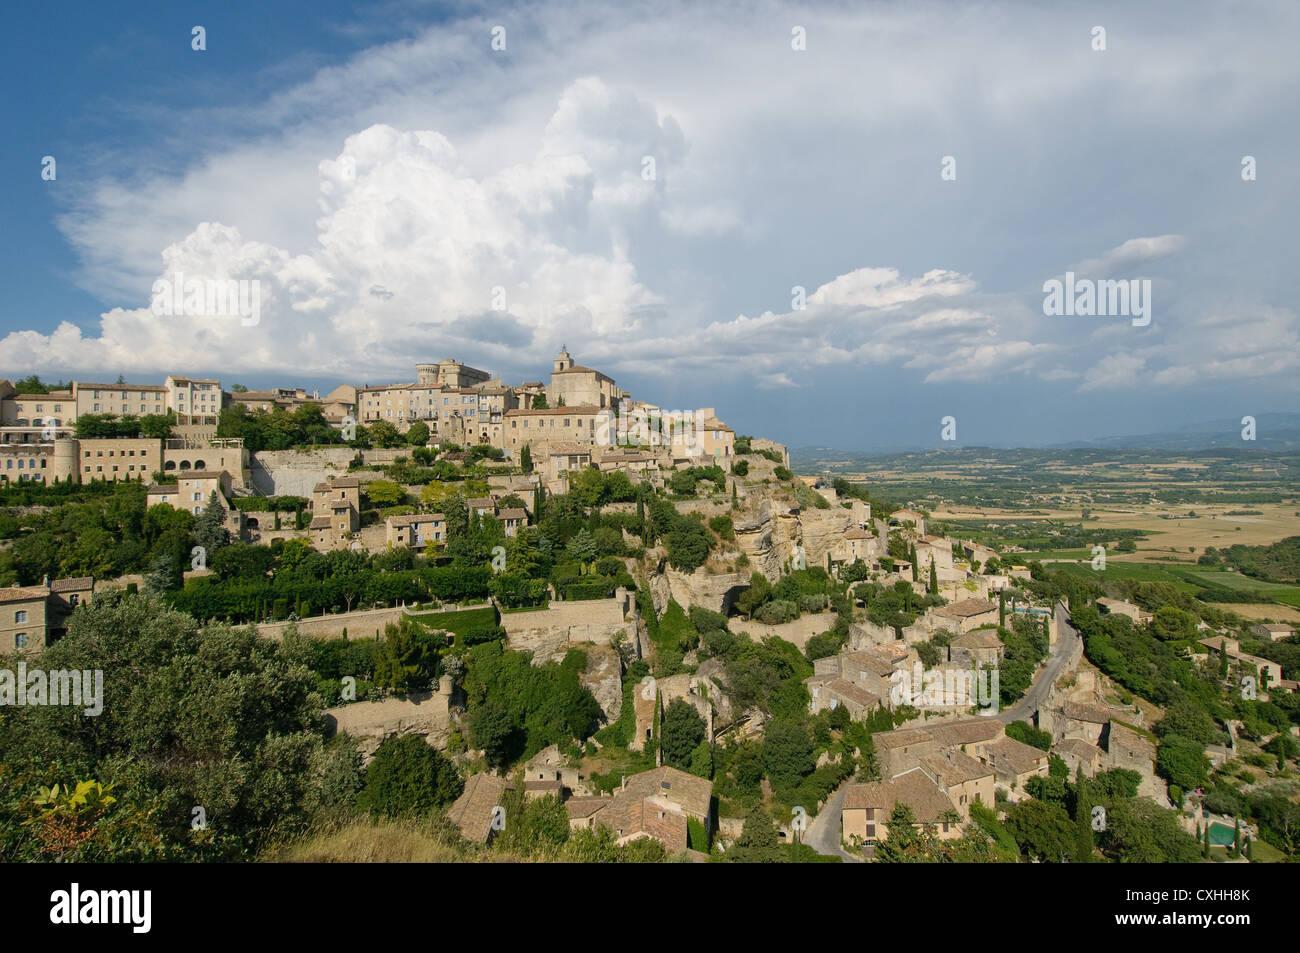 Provencal village of Gordes - Stock Image